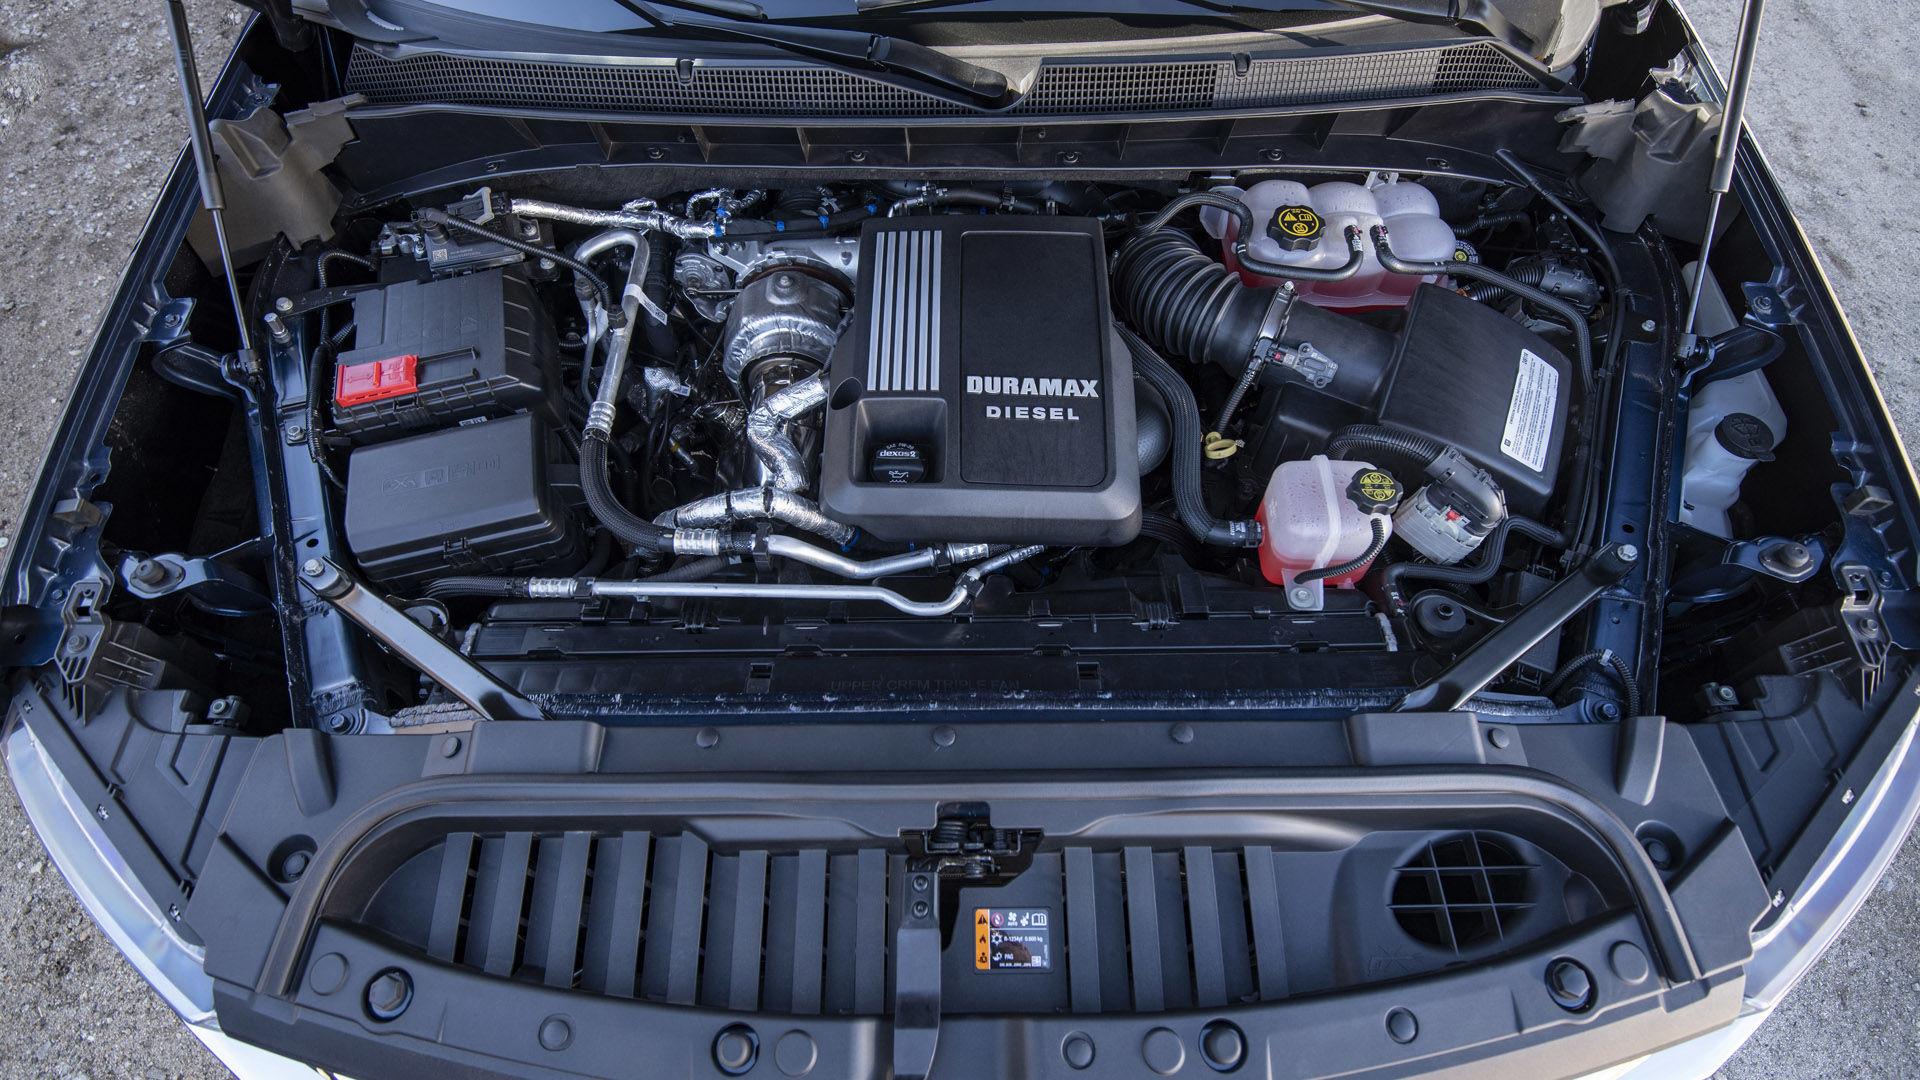 2020 Chevrolet Silverado 1500 Duramax First Drive Review   Impressions, specs, photos